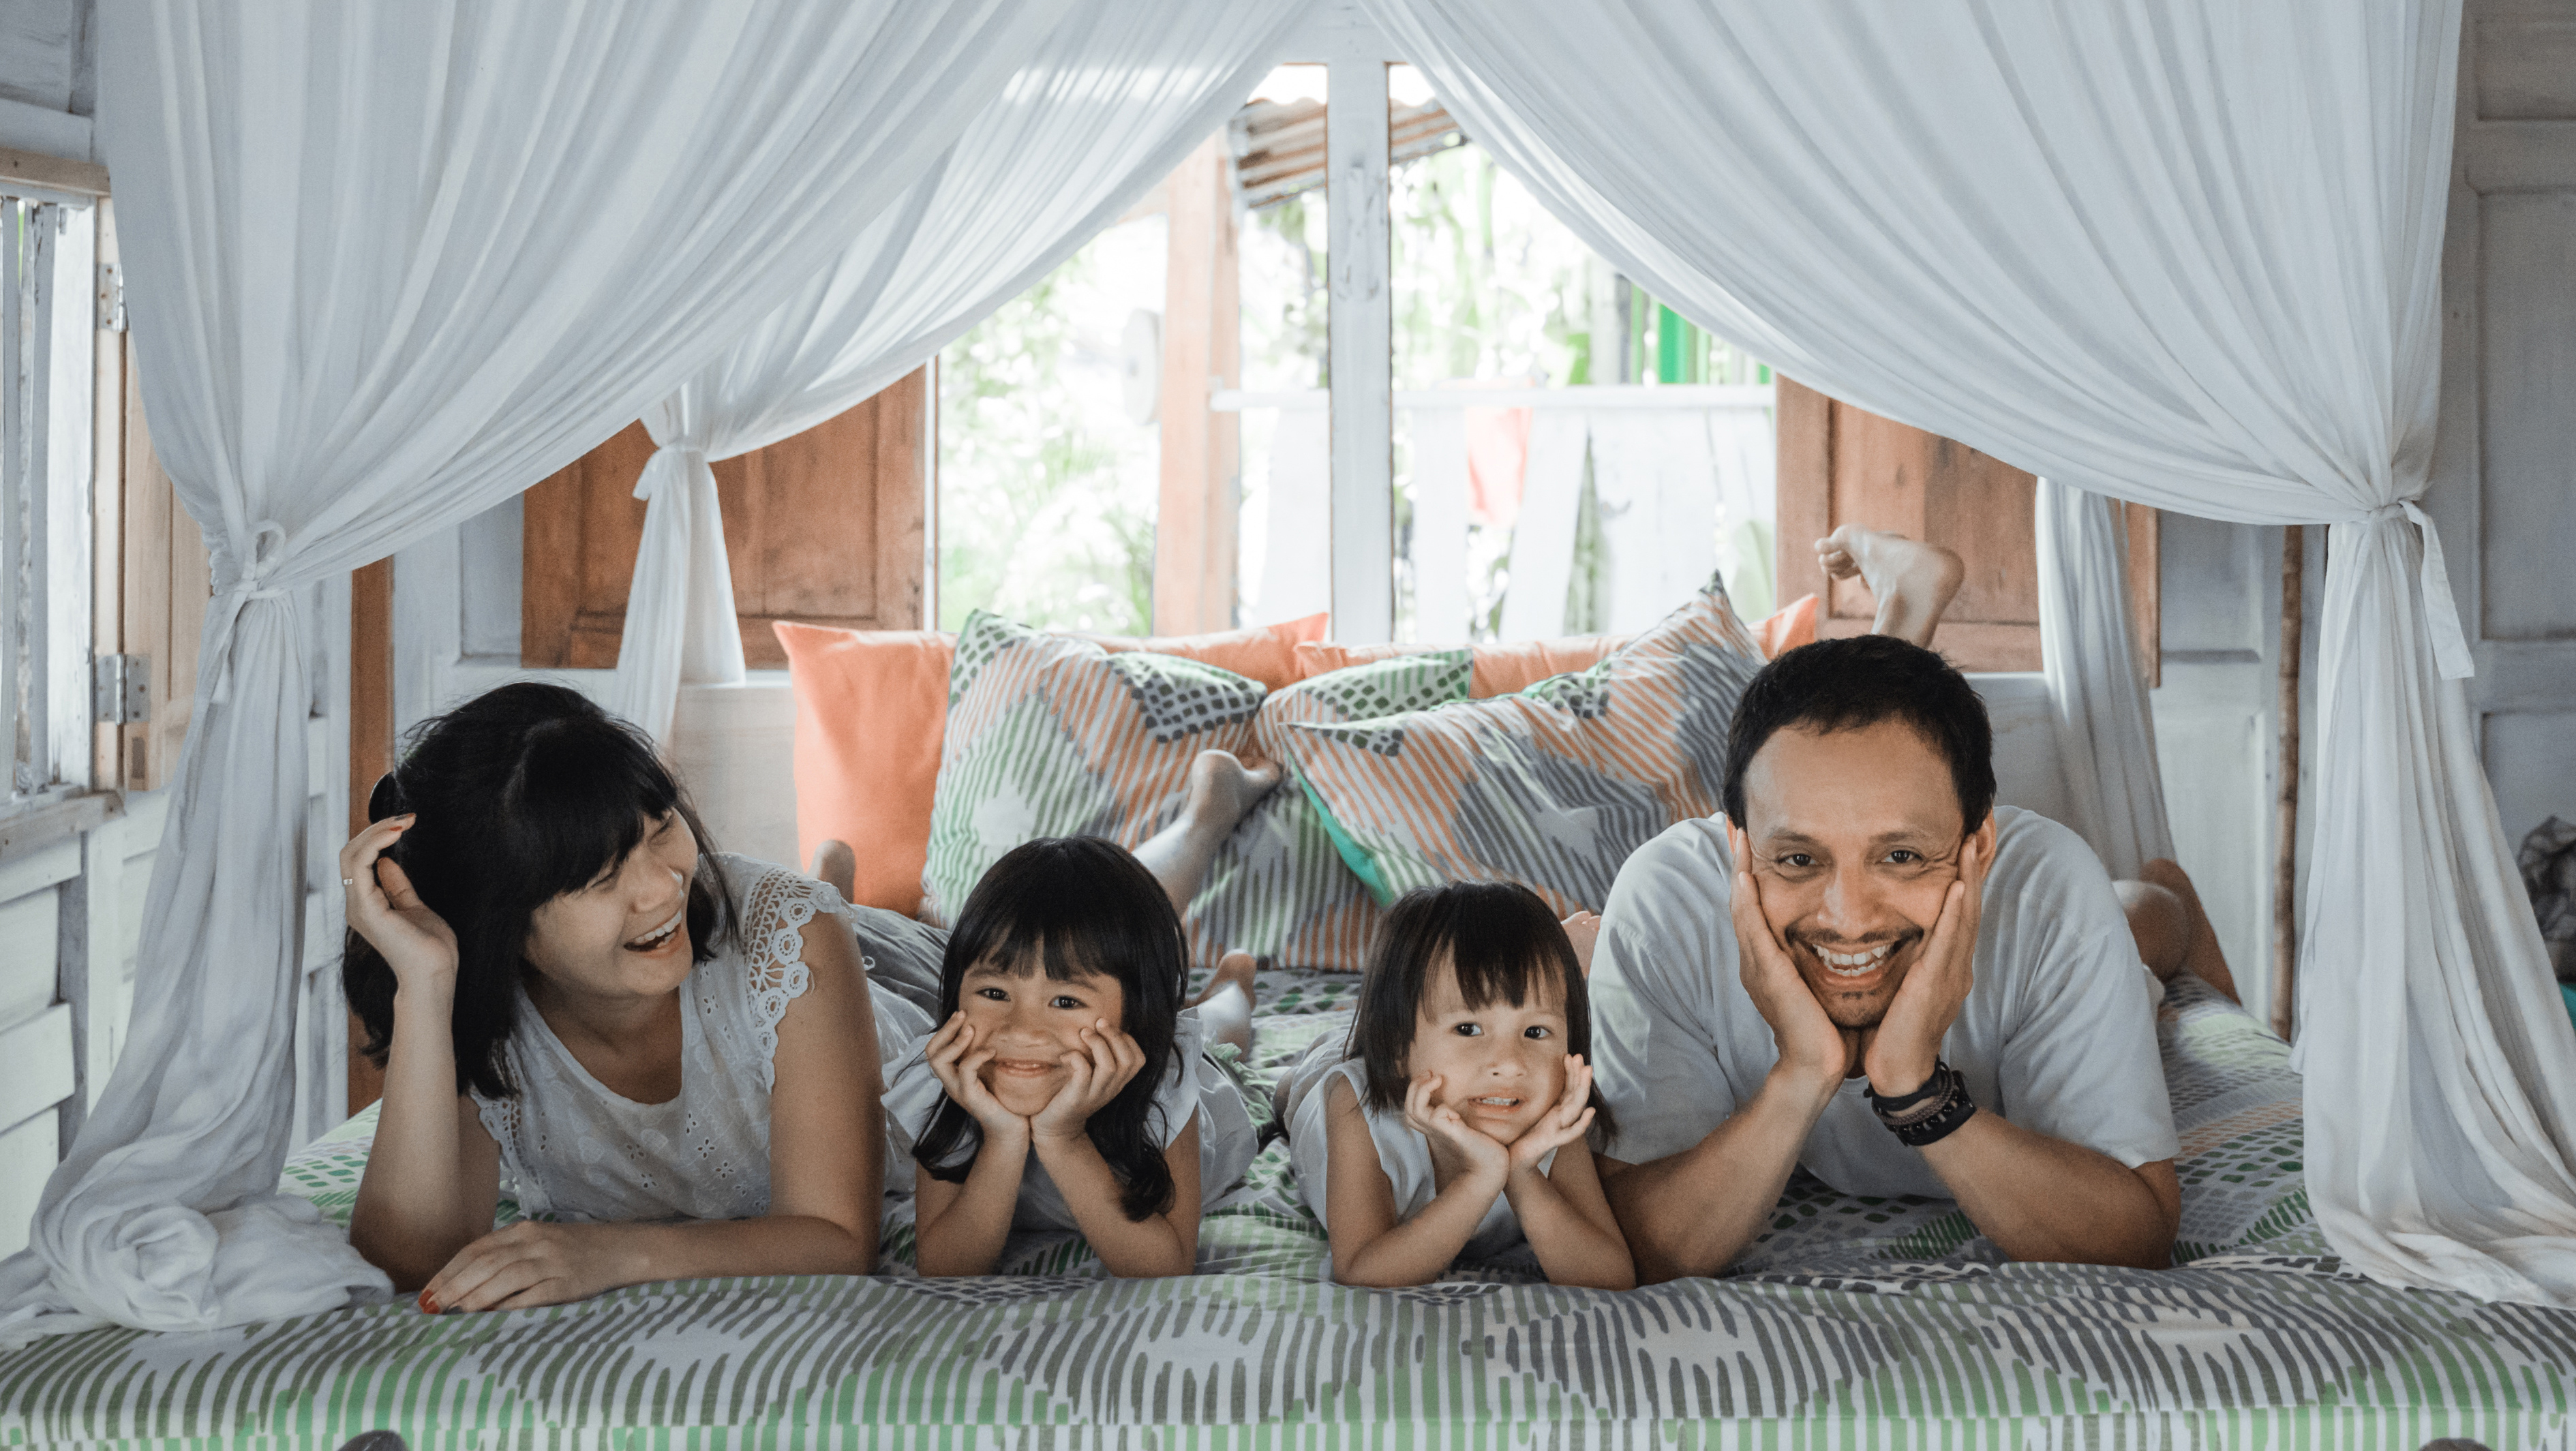 7 Ide Kamar Tidur Anak Sesuai RUU Ketahanan Keluarga